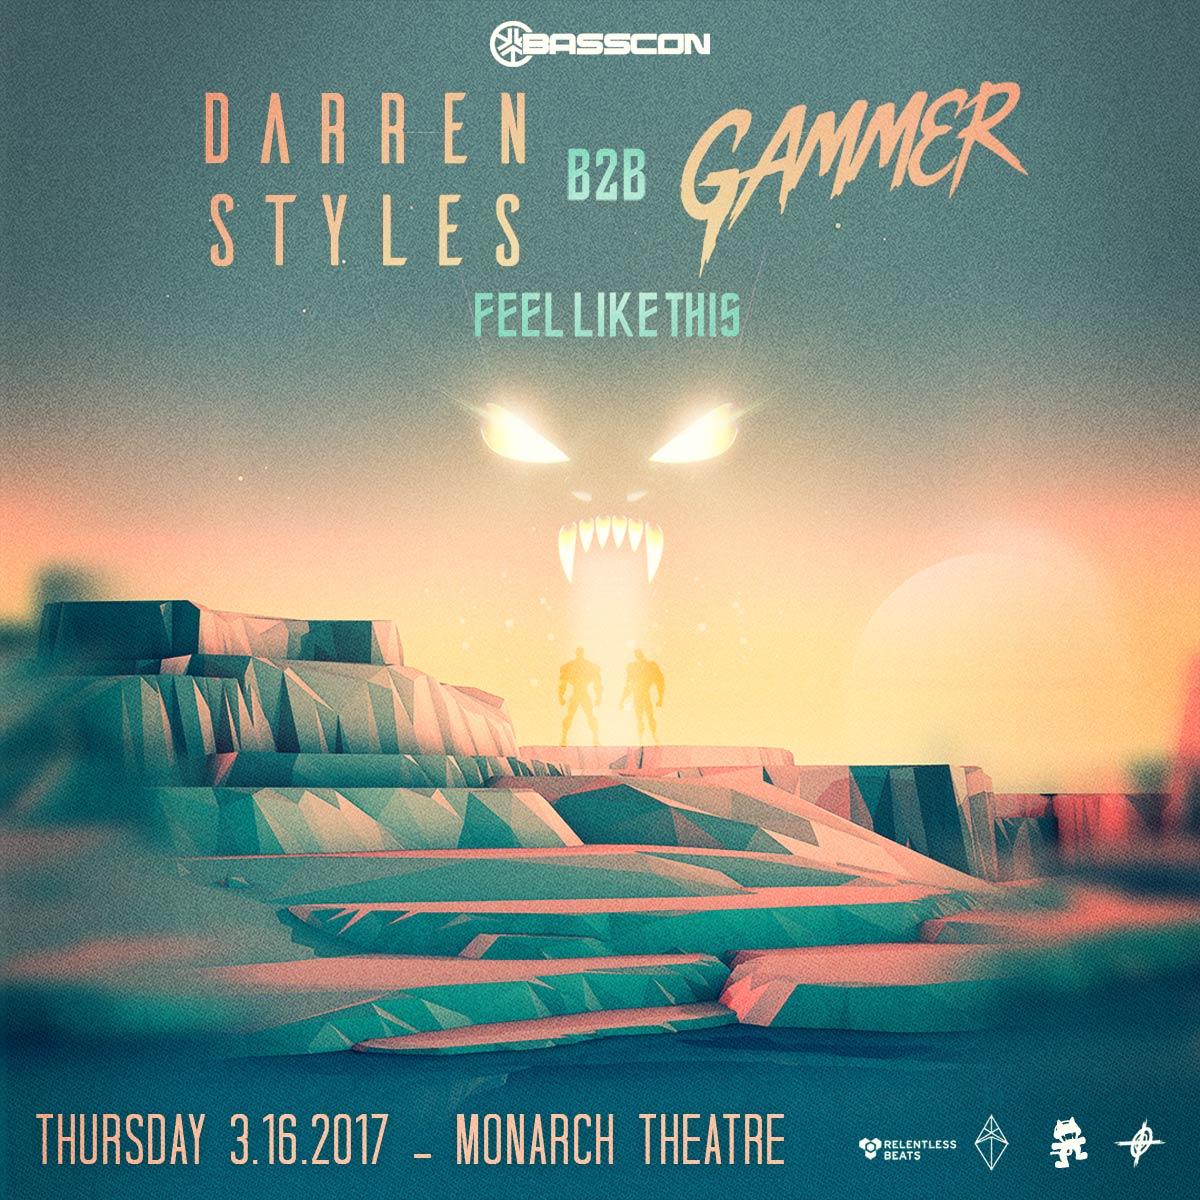 Flyer for Darren Styles b2b Gammer - Feel Like This